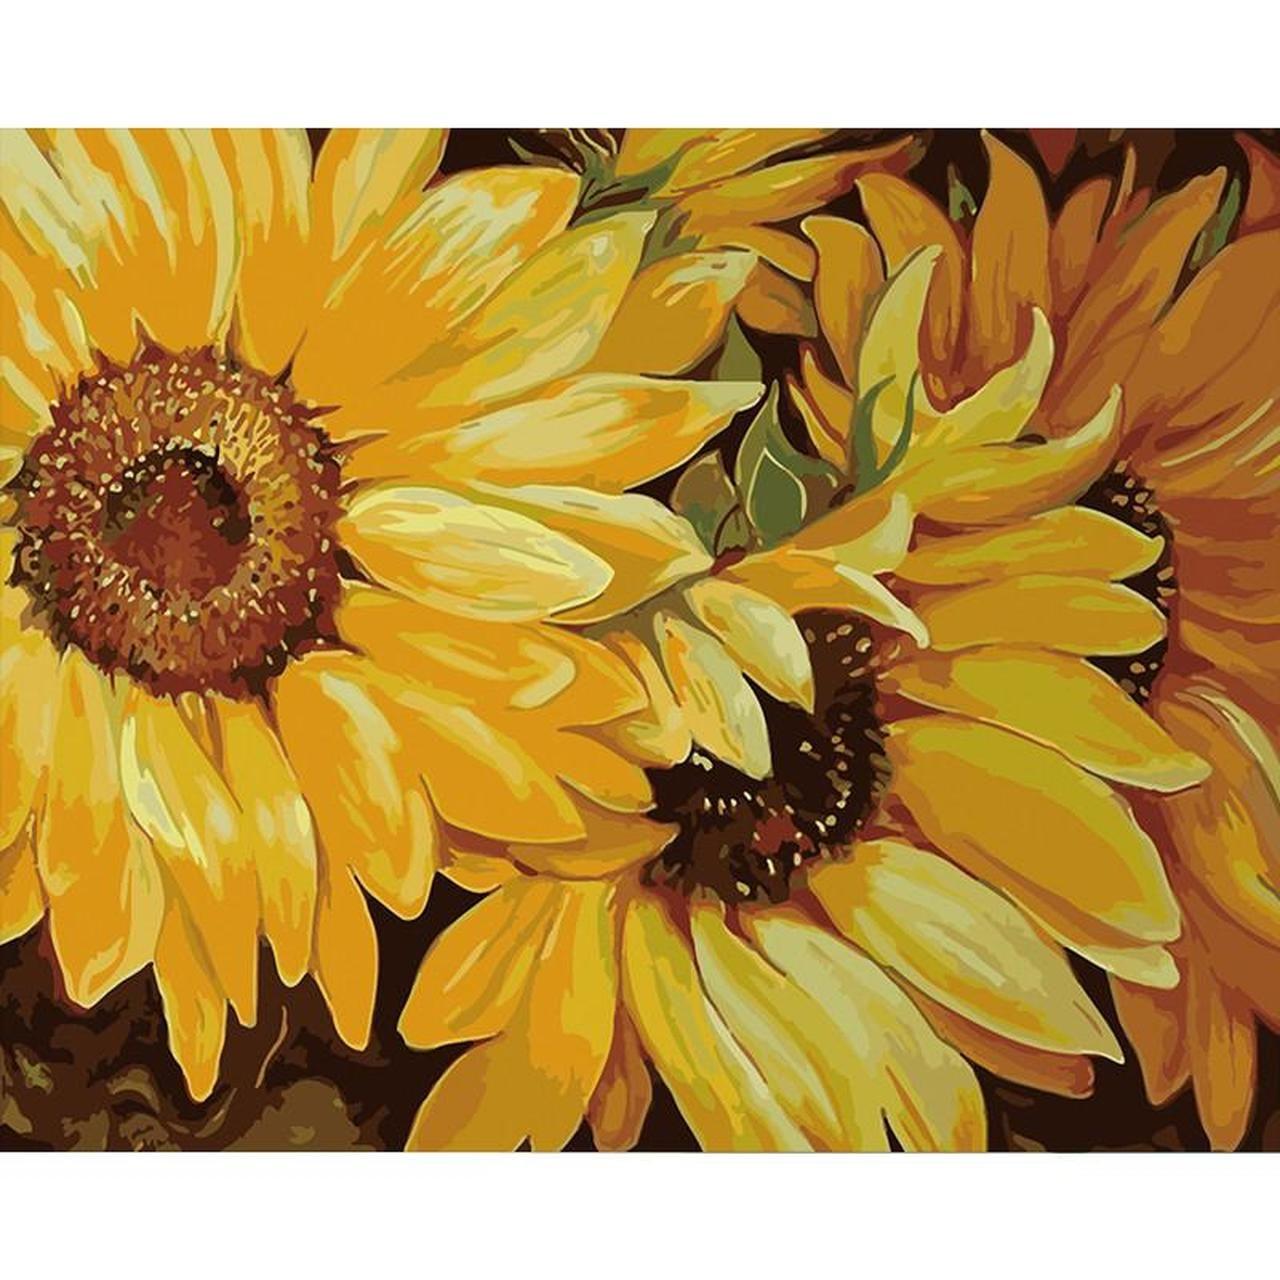 Sunflower Elegance Diy Painting By Numbers Kit In 2020 Diy Painting Paint By Number Sunflower